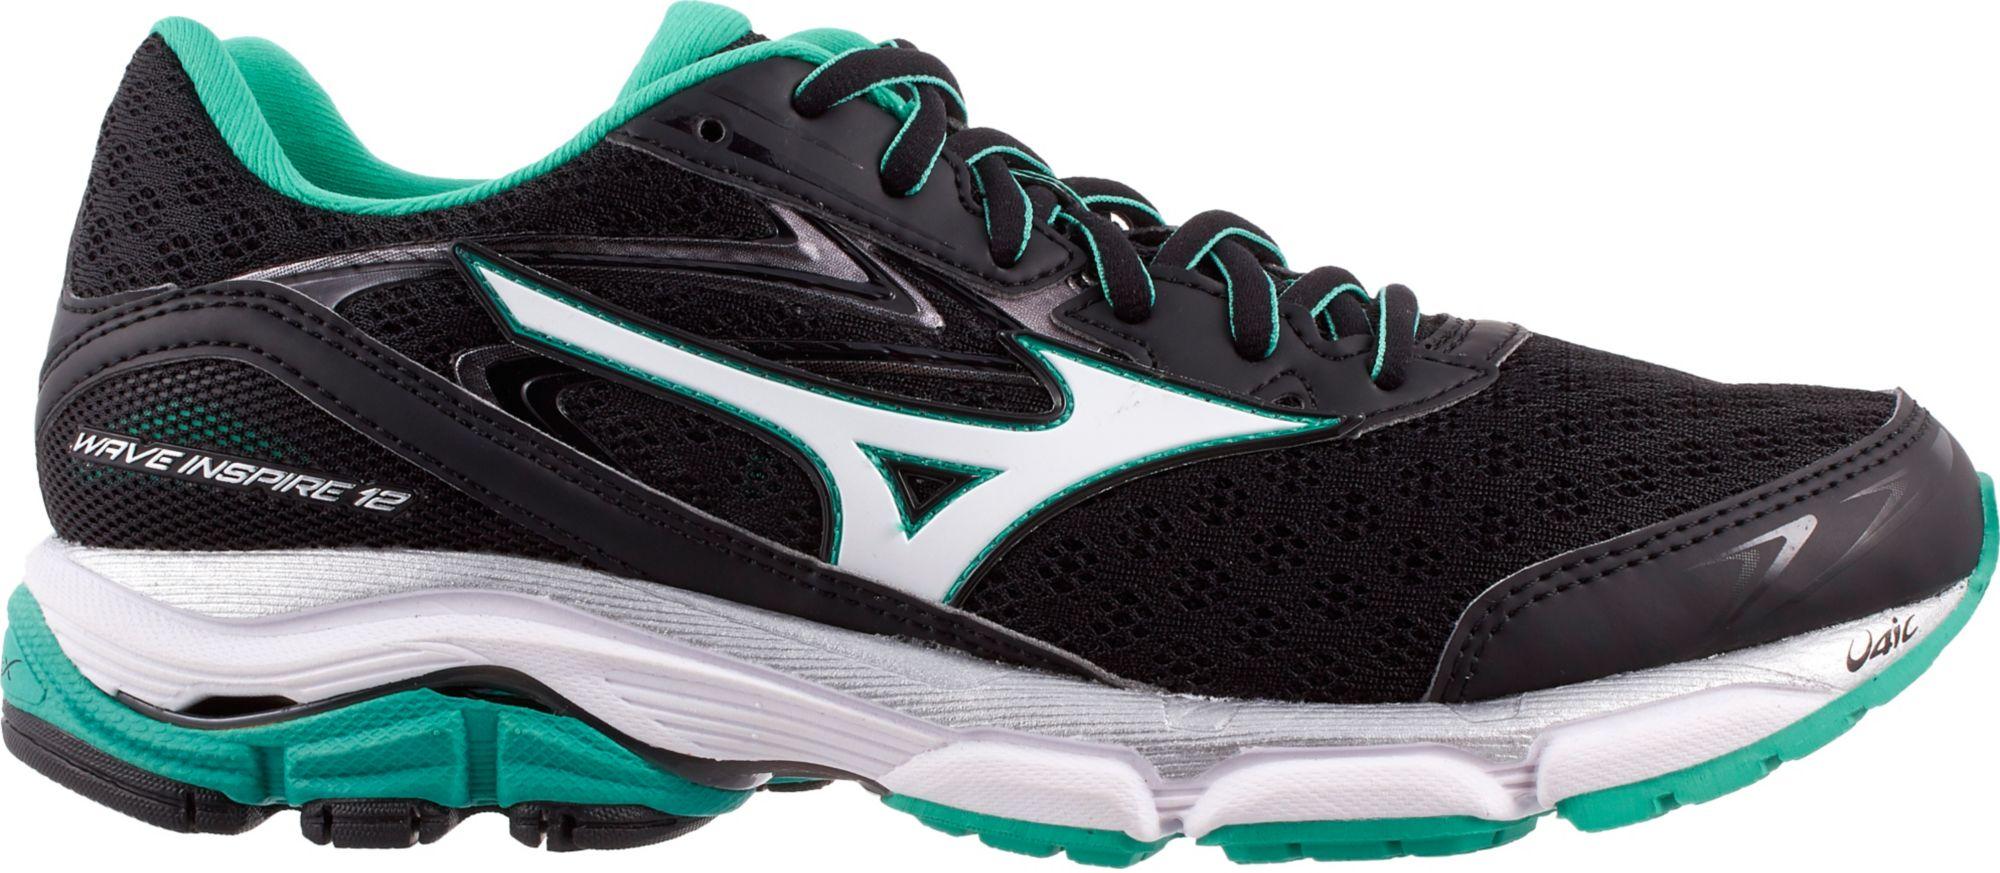 Mizuno Women's Wave Inspire 12 Running Shoes. 0:00. 0:00 / 0:00.  noImageFound ???